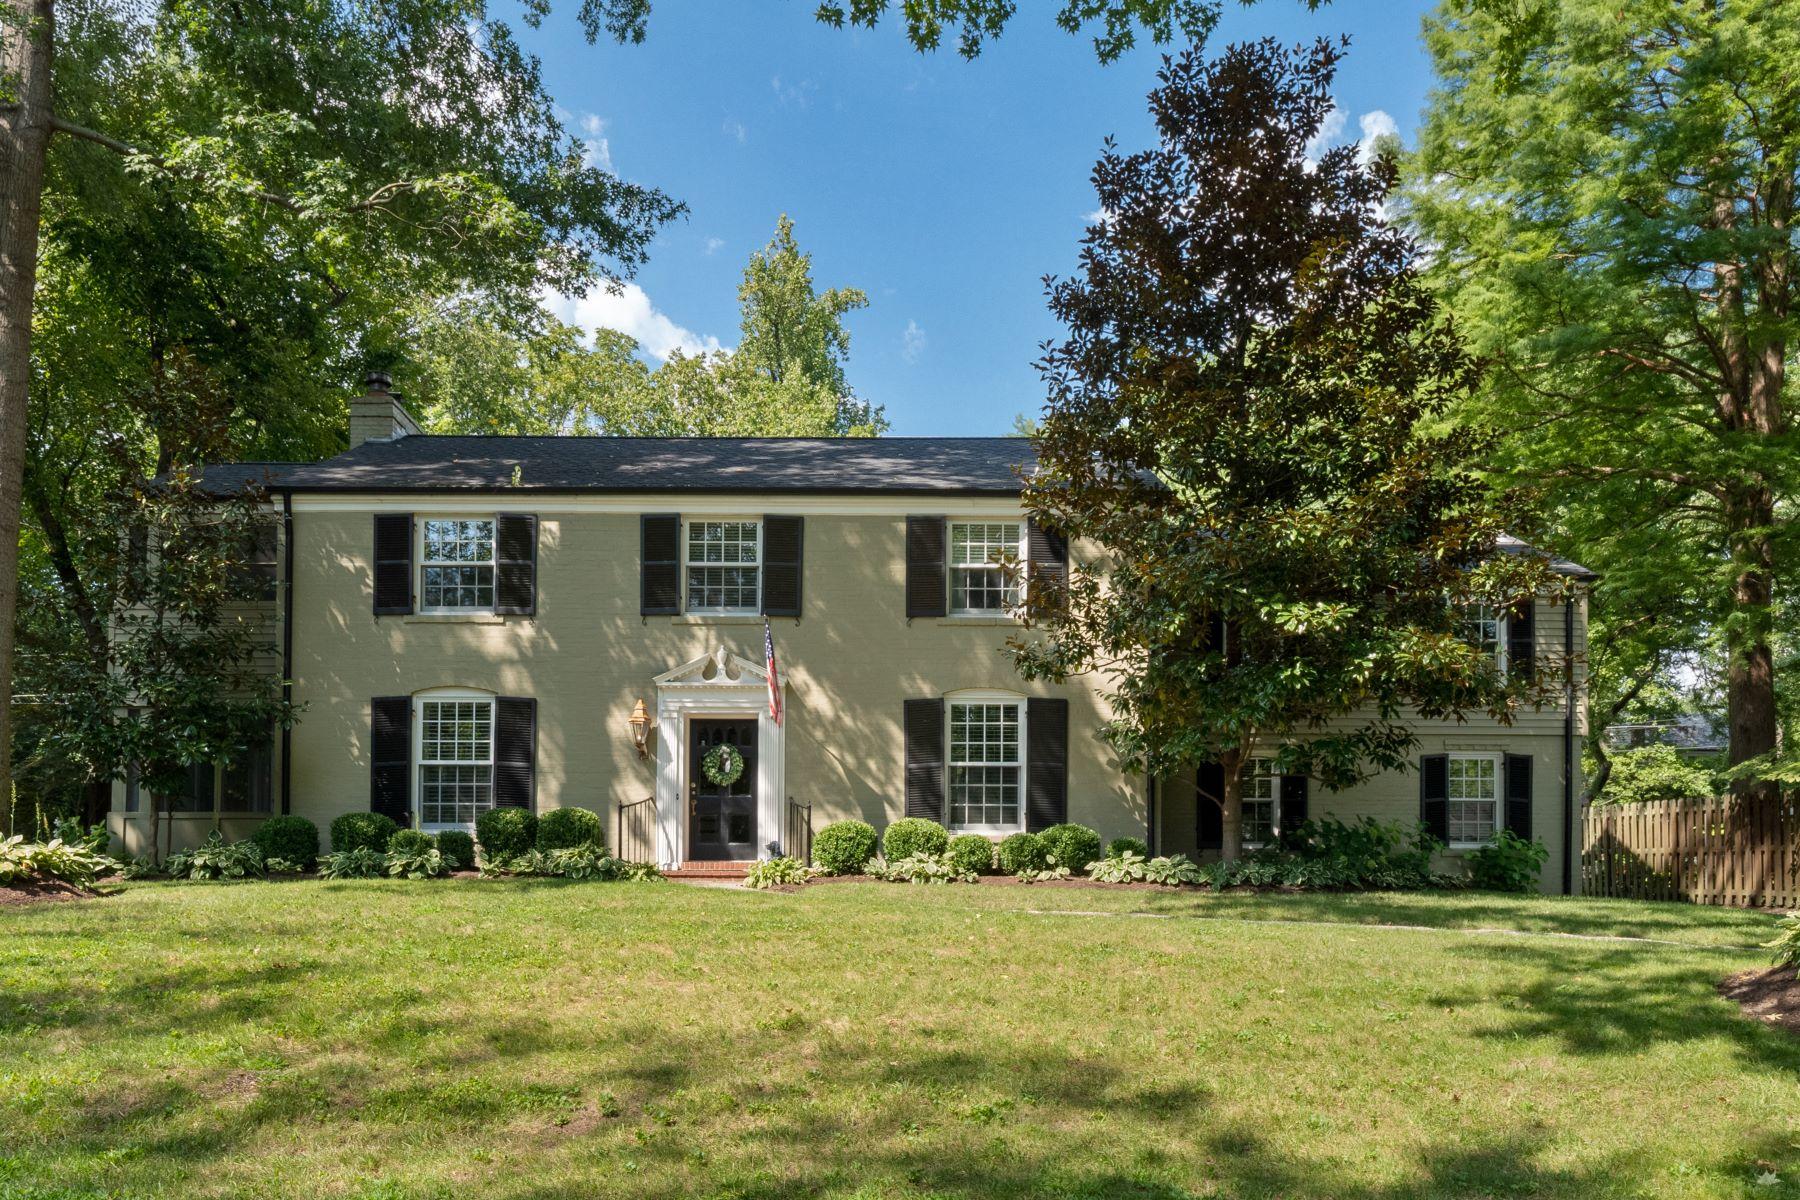 Property for Sale at Ladue Charmer 19 Black Creek Lane Ladue, Missouri 63124 United States